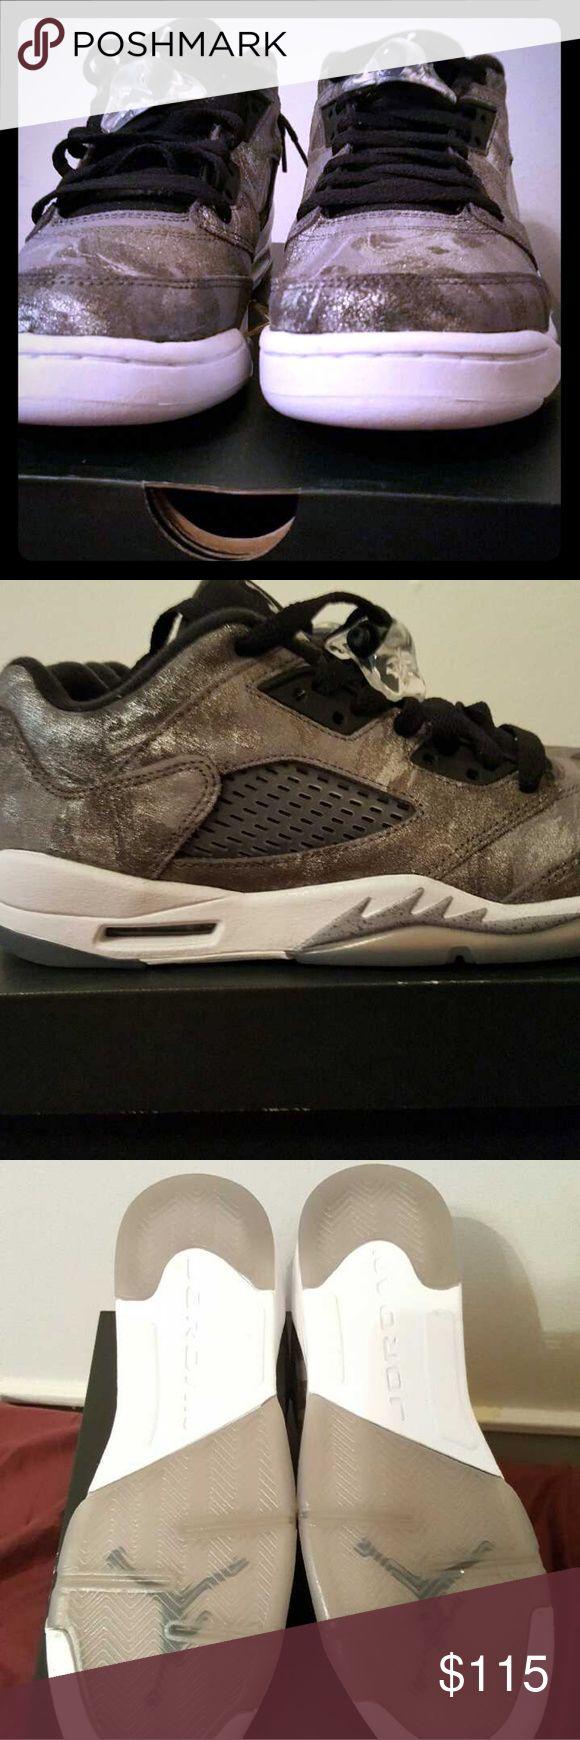 Retro jordan 5 low Grey matalic fatigue Jordan Shoes Athletic Shoes